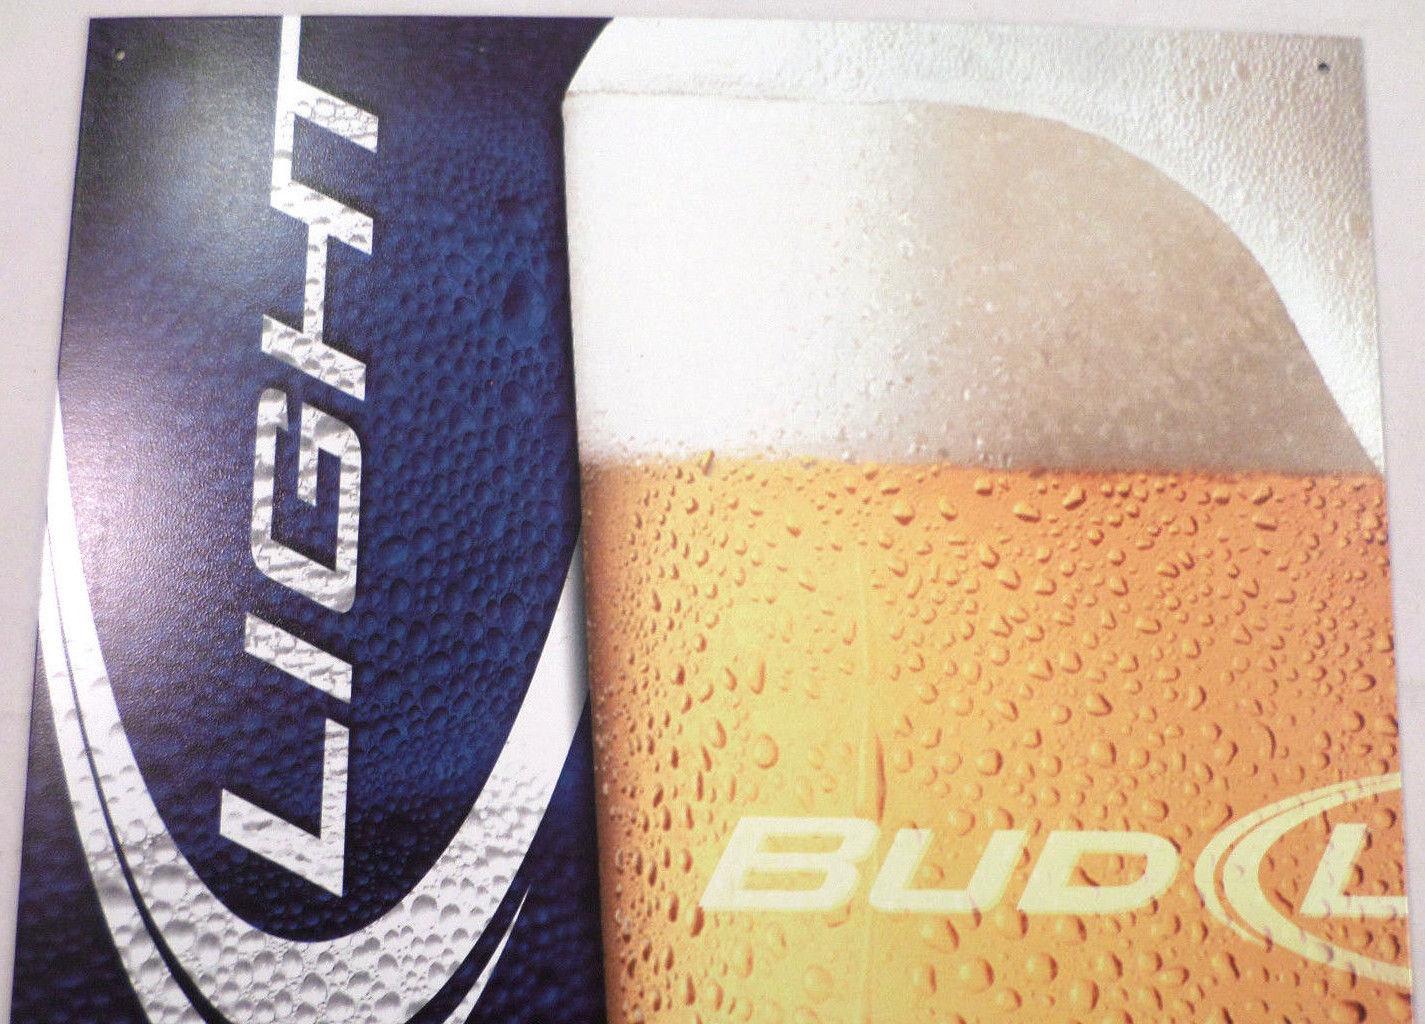 Bud Light Man Cave Signs : Budweiser bud light beer frosty glass tin sign man cave